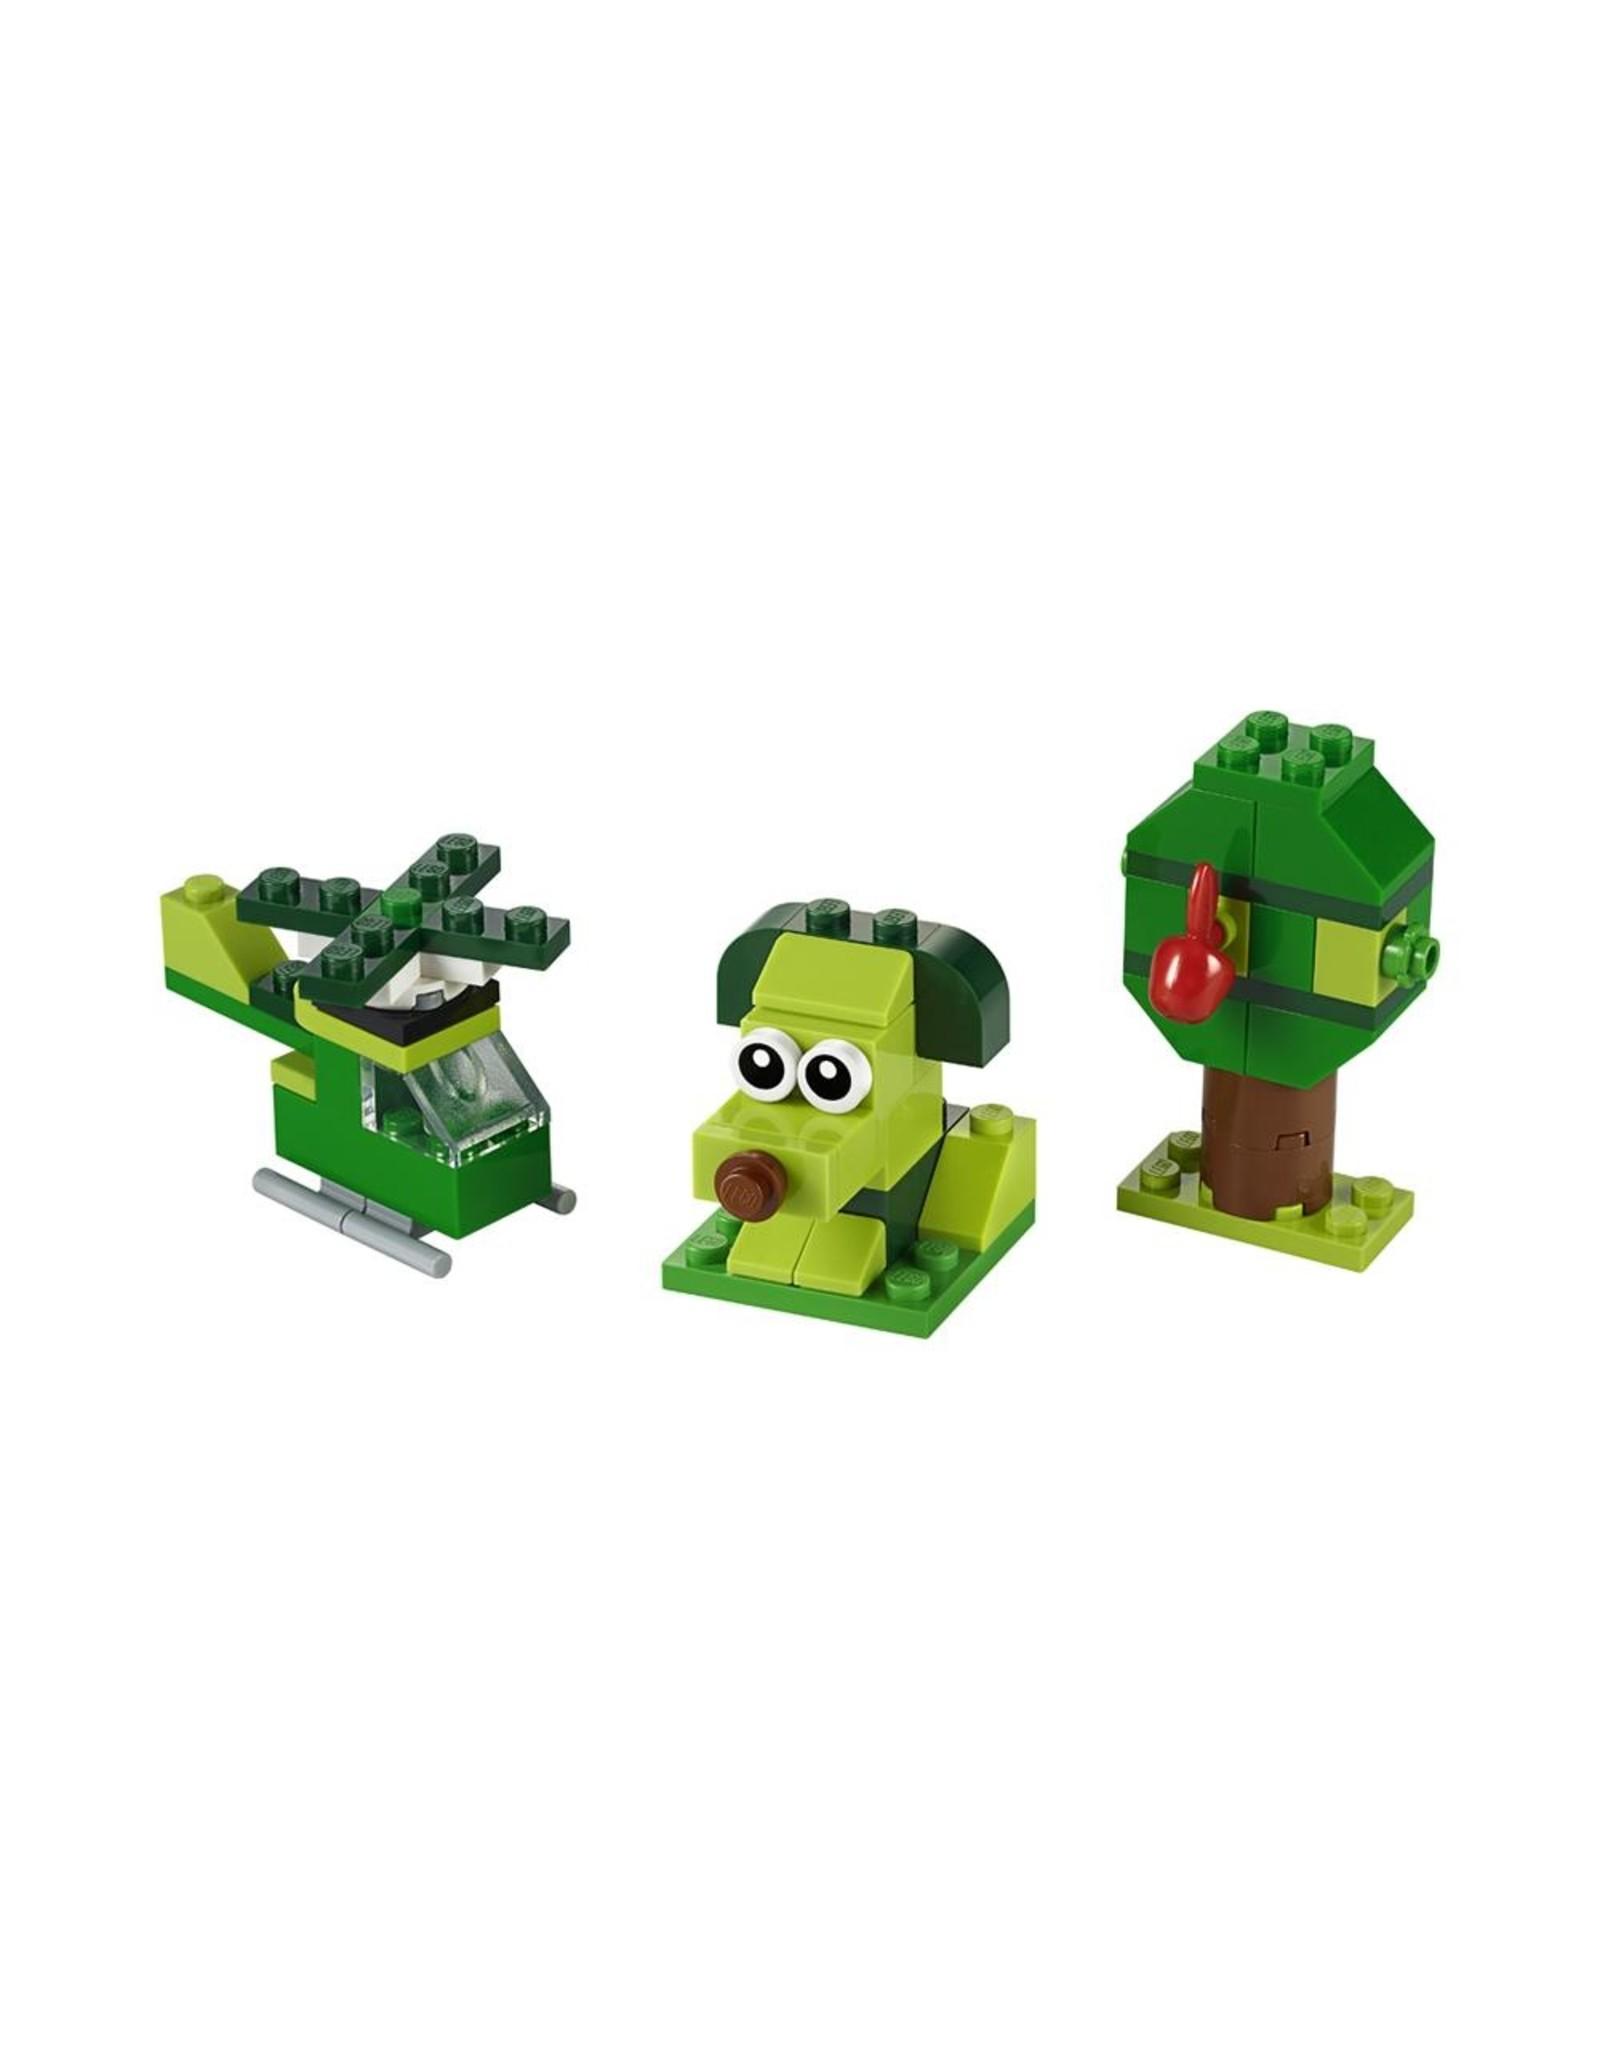 LEGO Lego Classic 11007 Creative Green Bricks